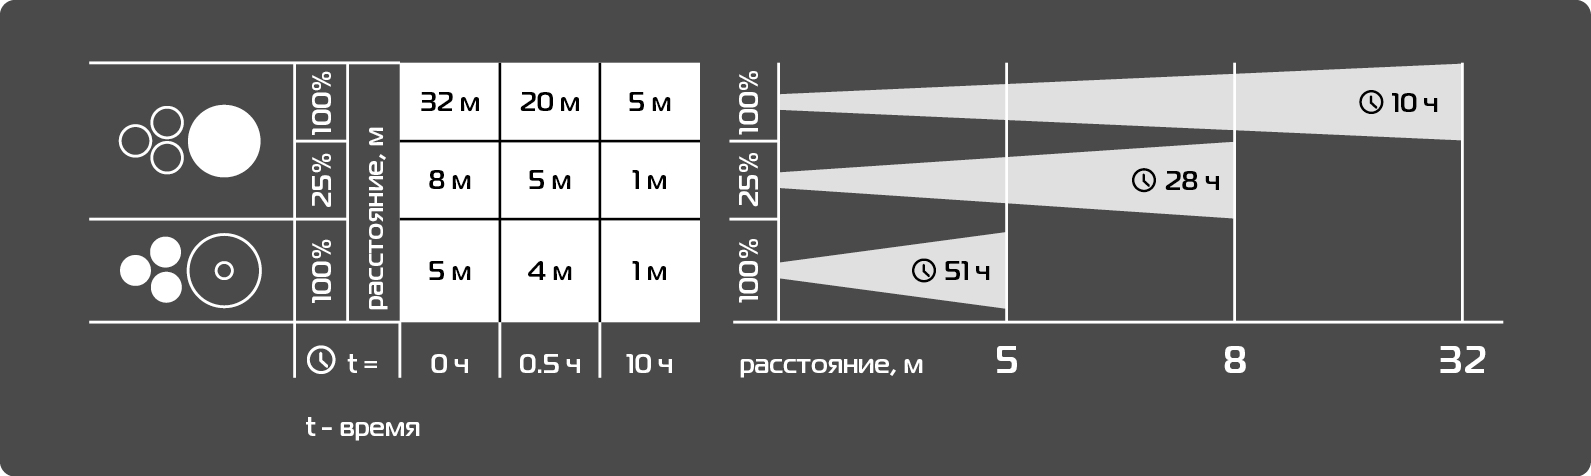 lh-080_pic03.jpg